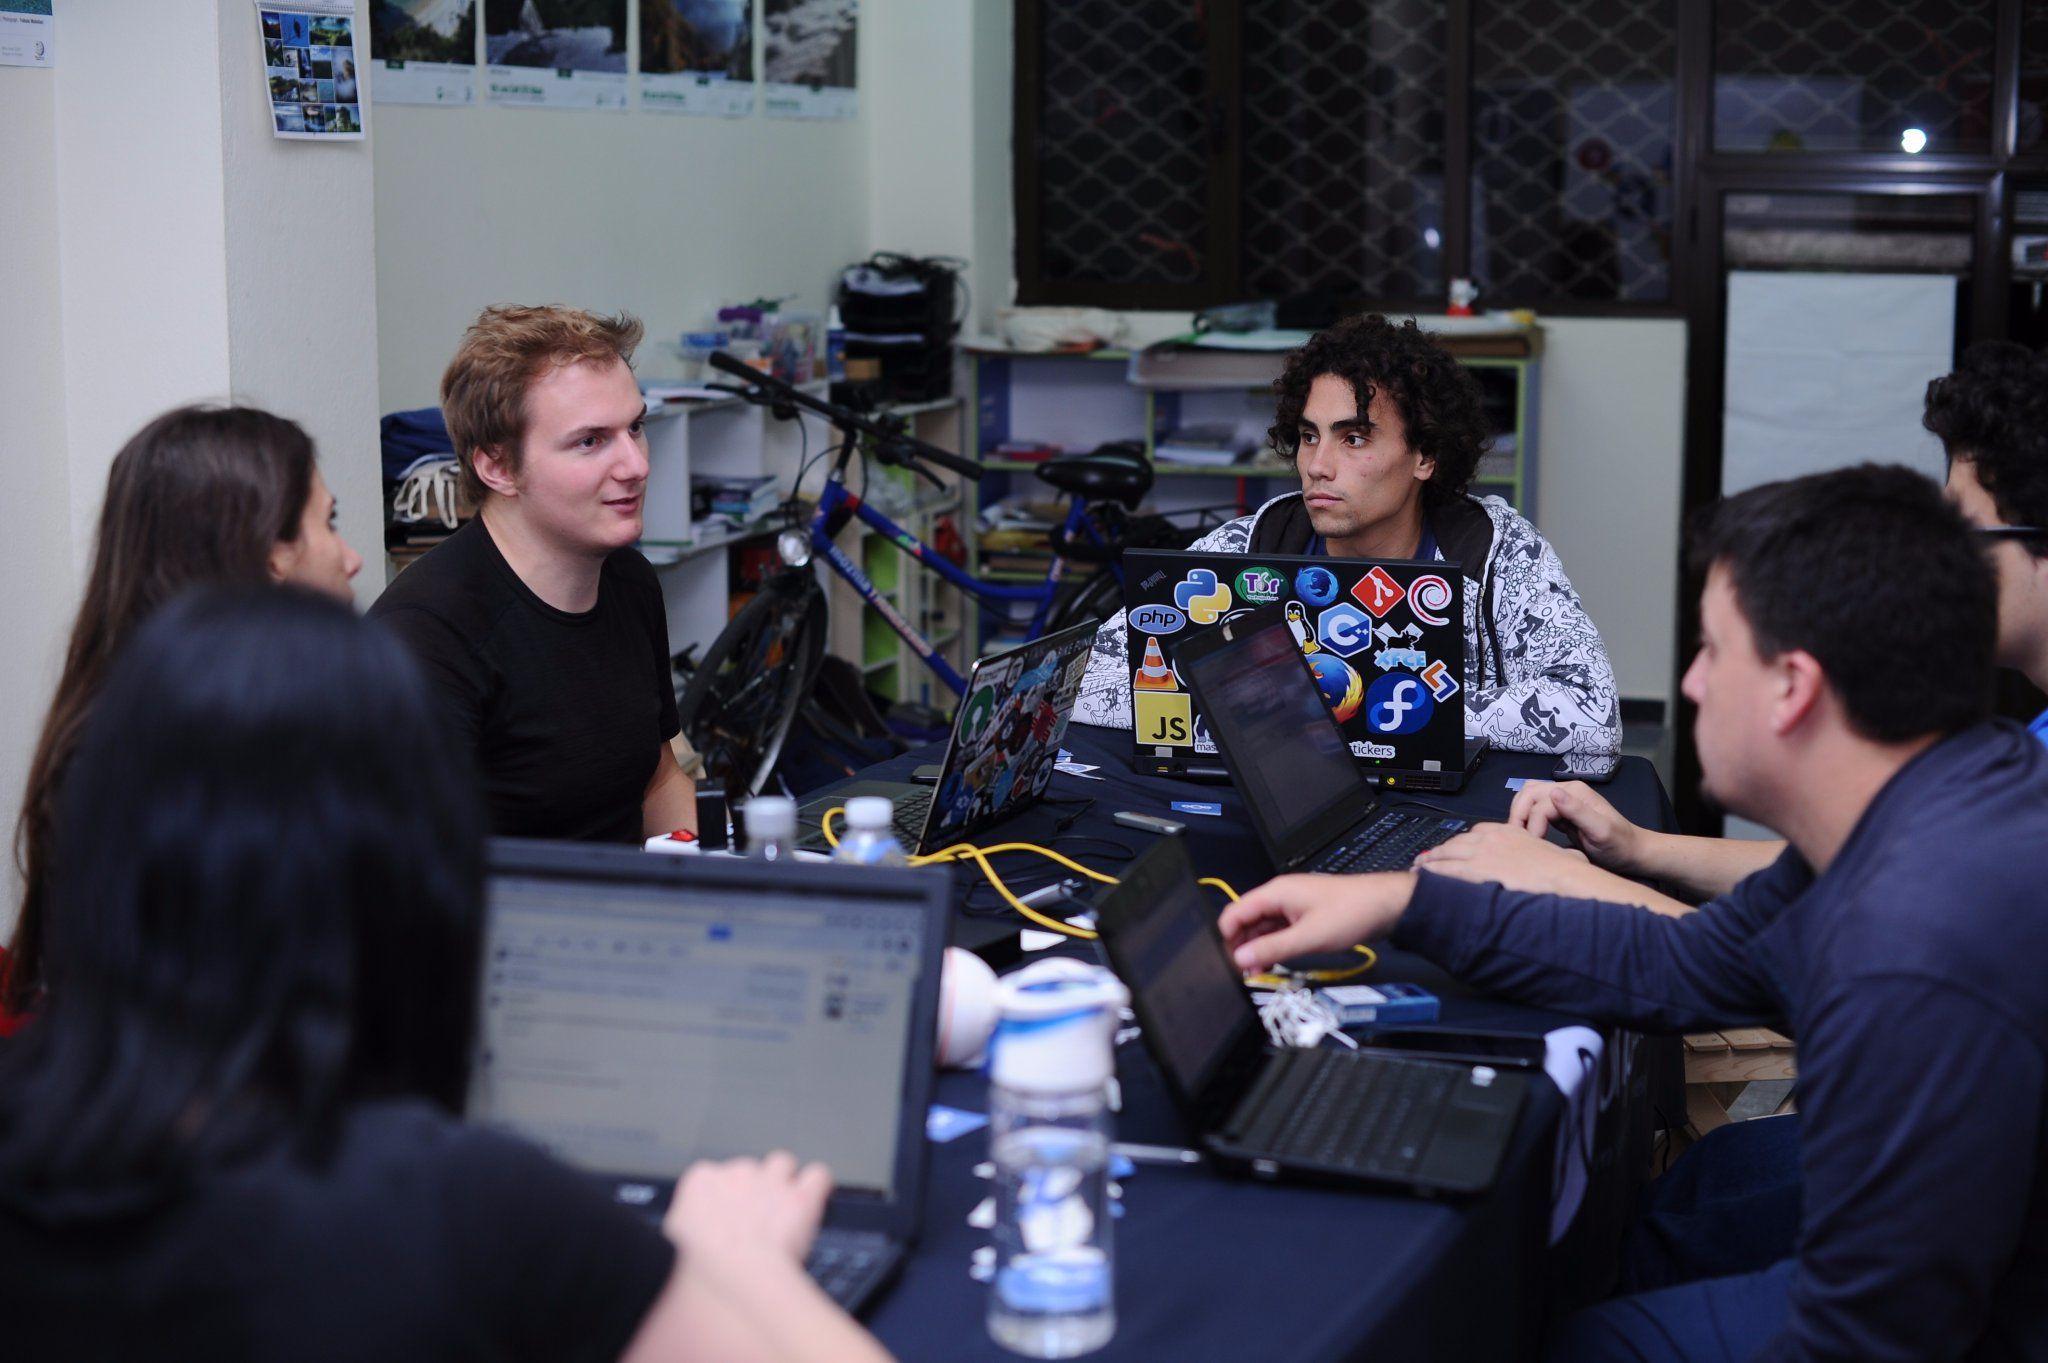 Tirana Nextcloud community